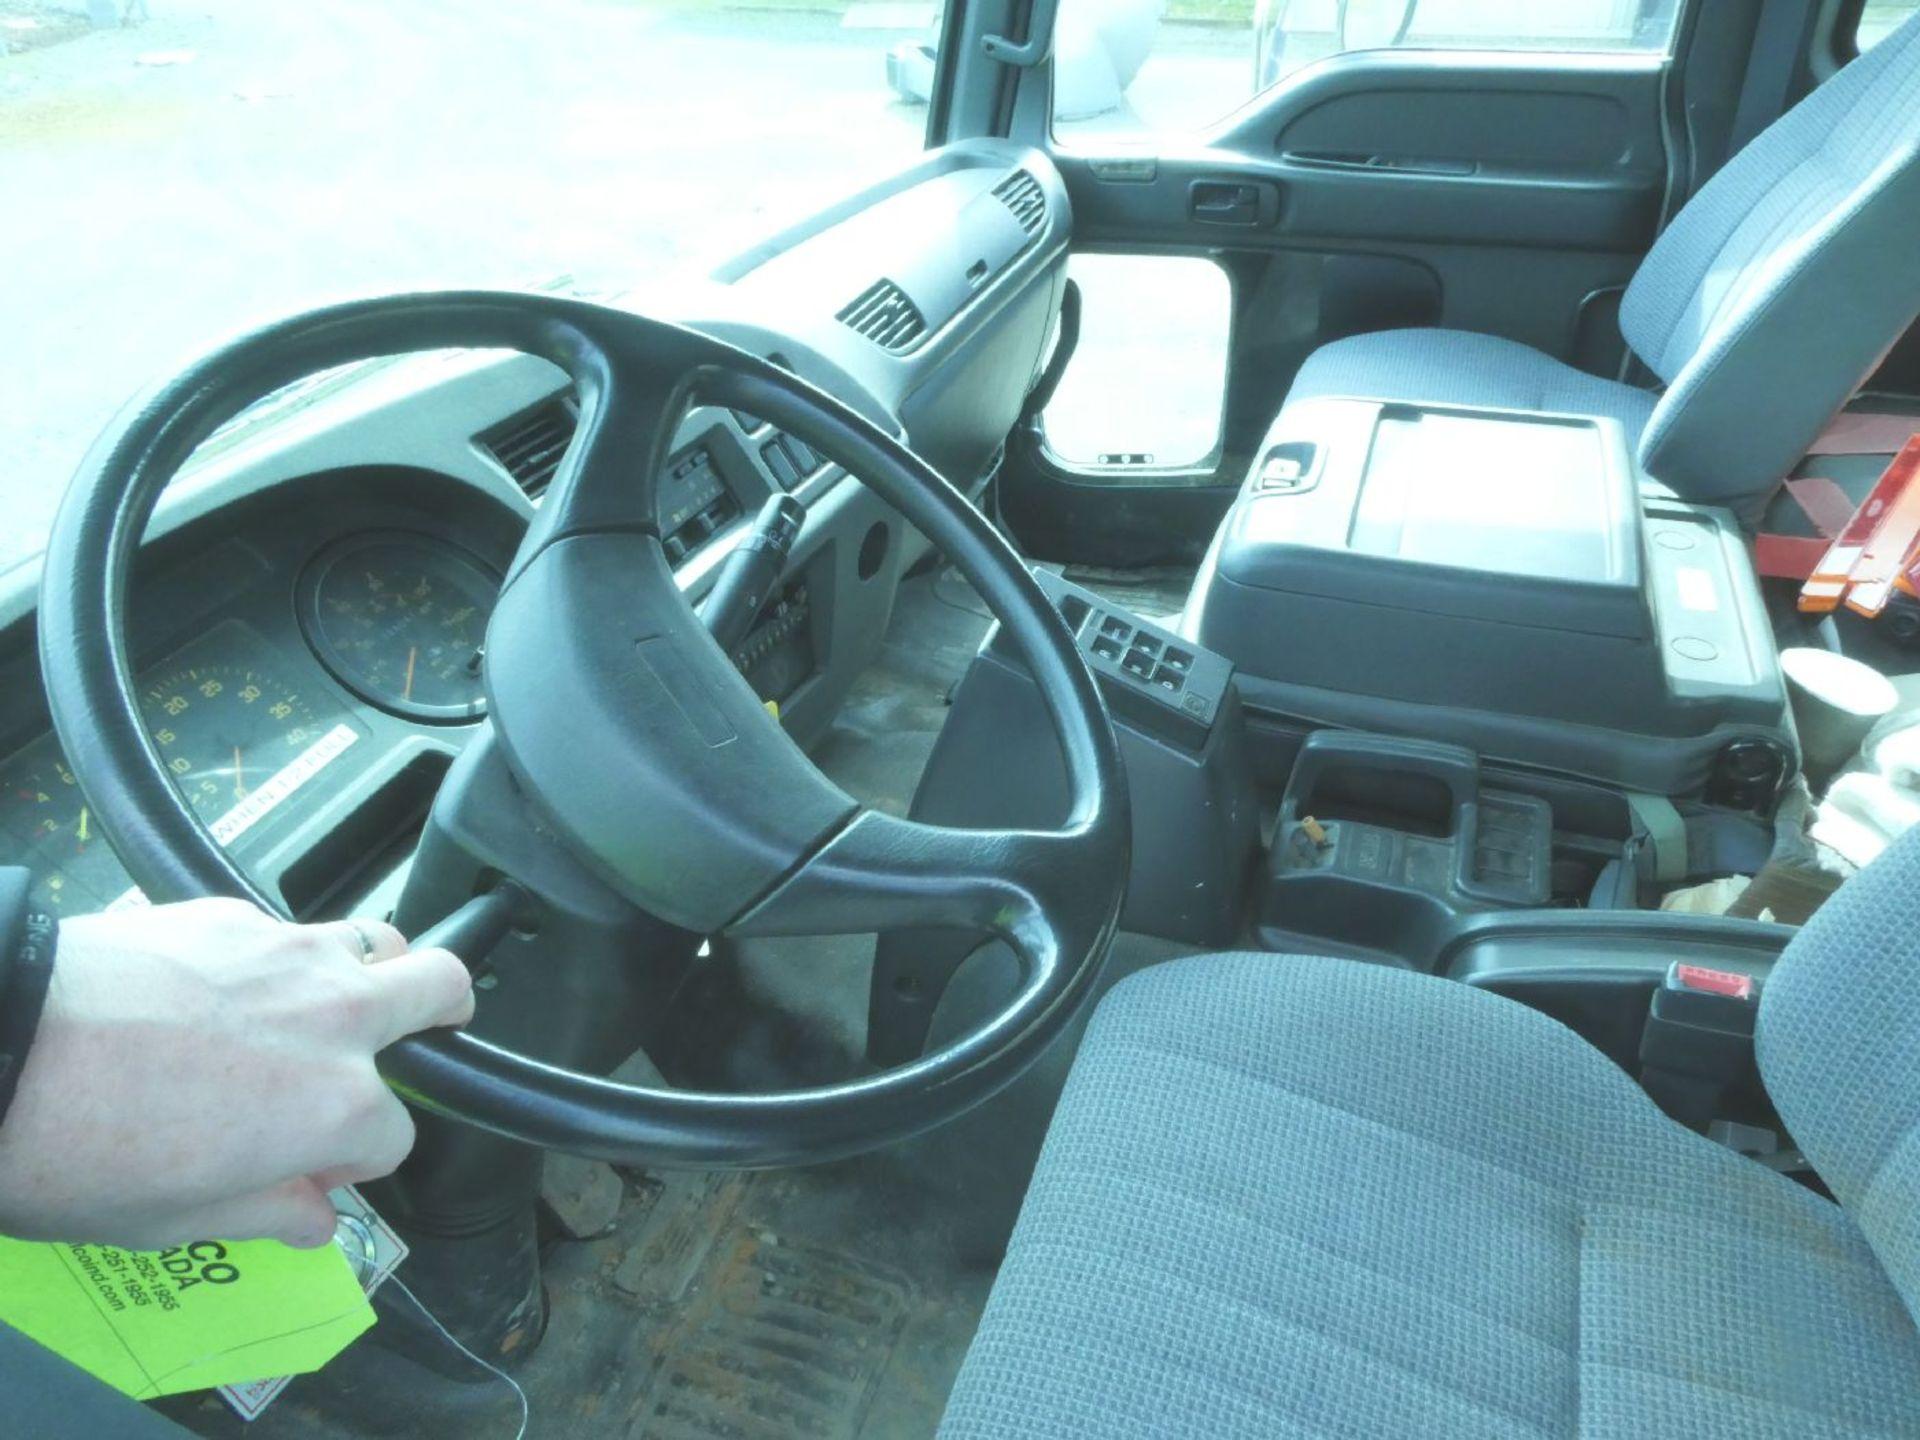 GMC T8500 Single Axle Box Truck - Image 2 of 5